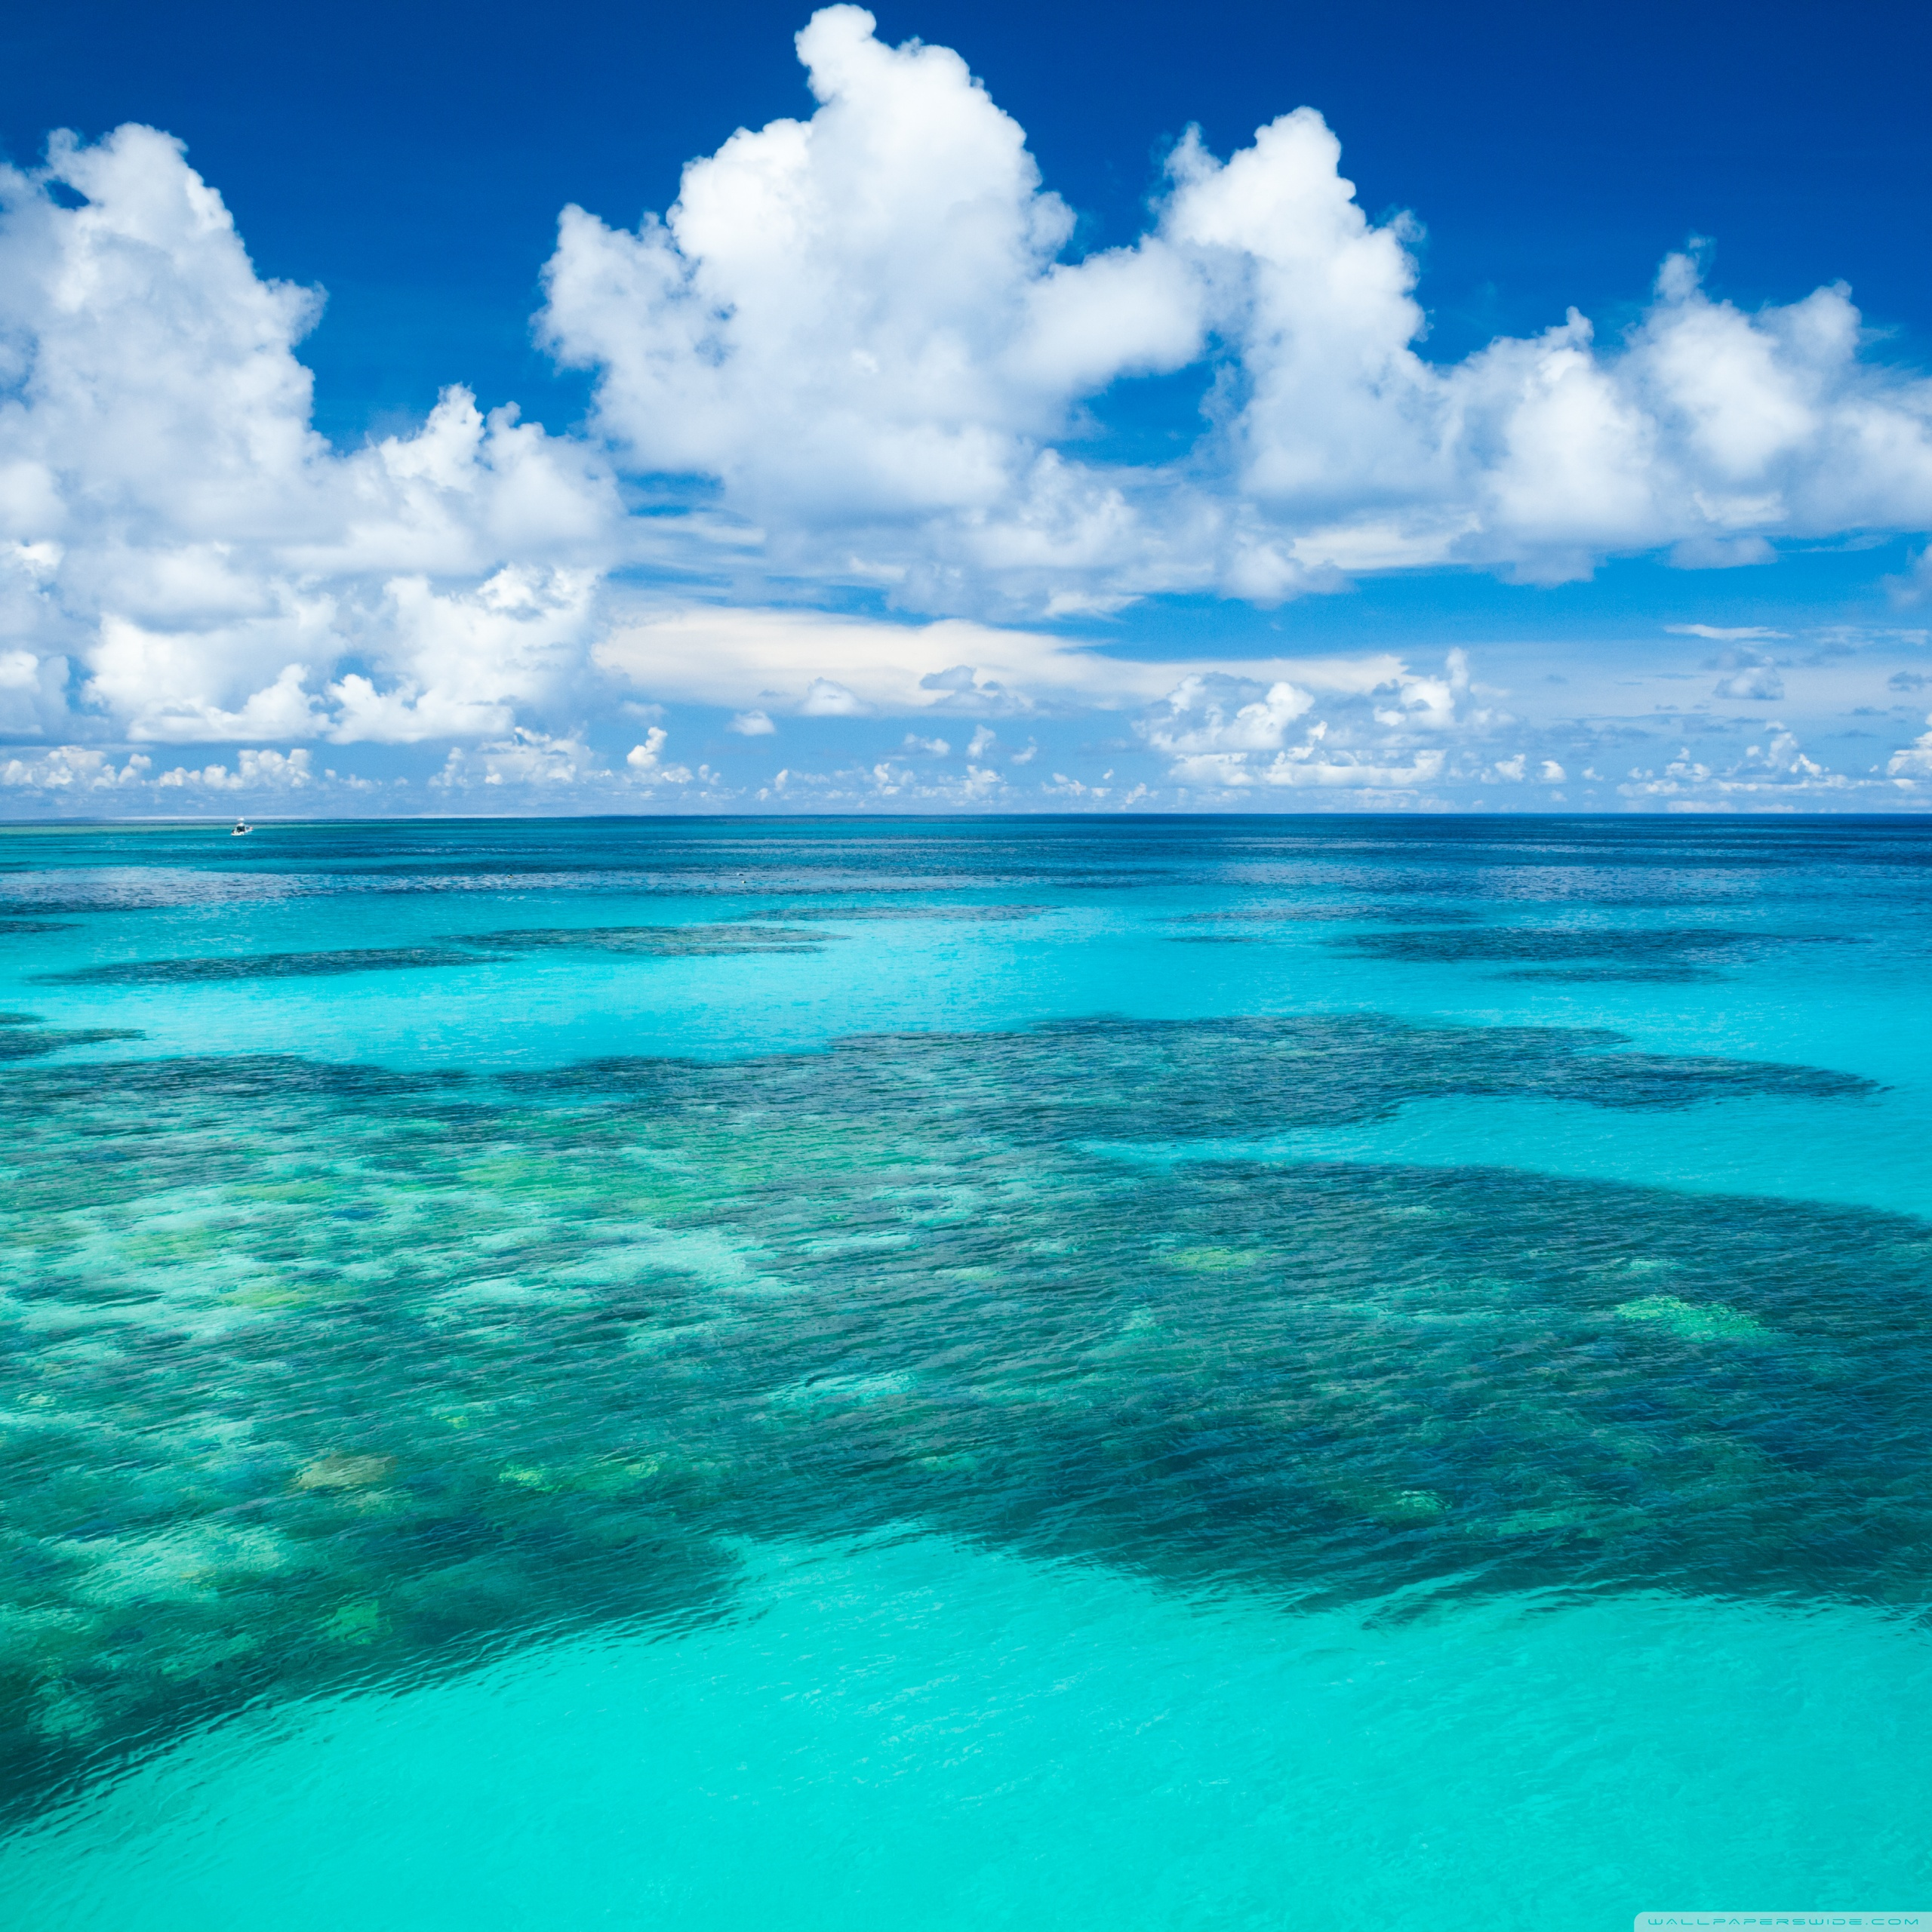 Hd Ocean Wallpaper: Cool HD Wallpapers Backgrounds